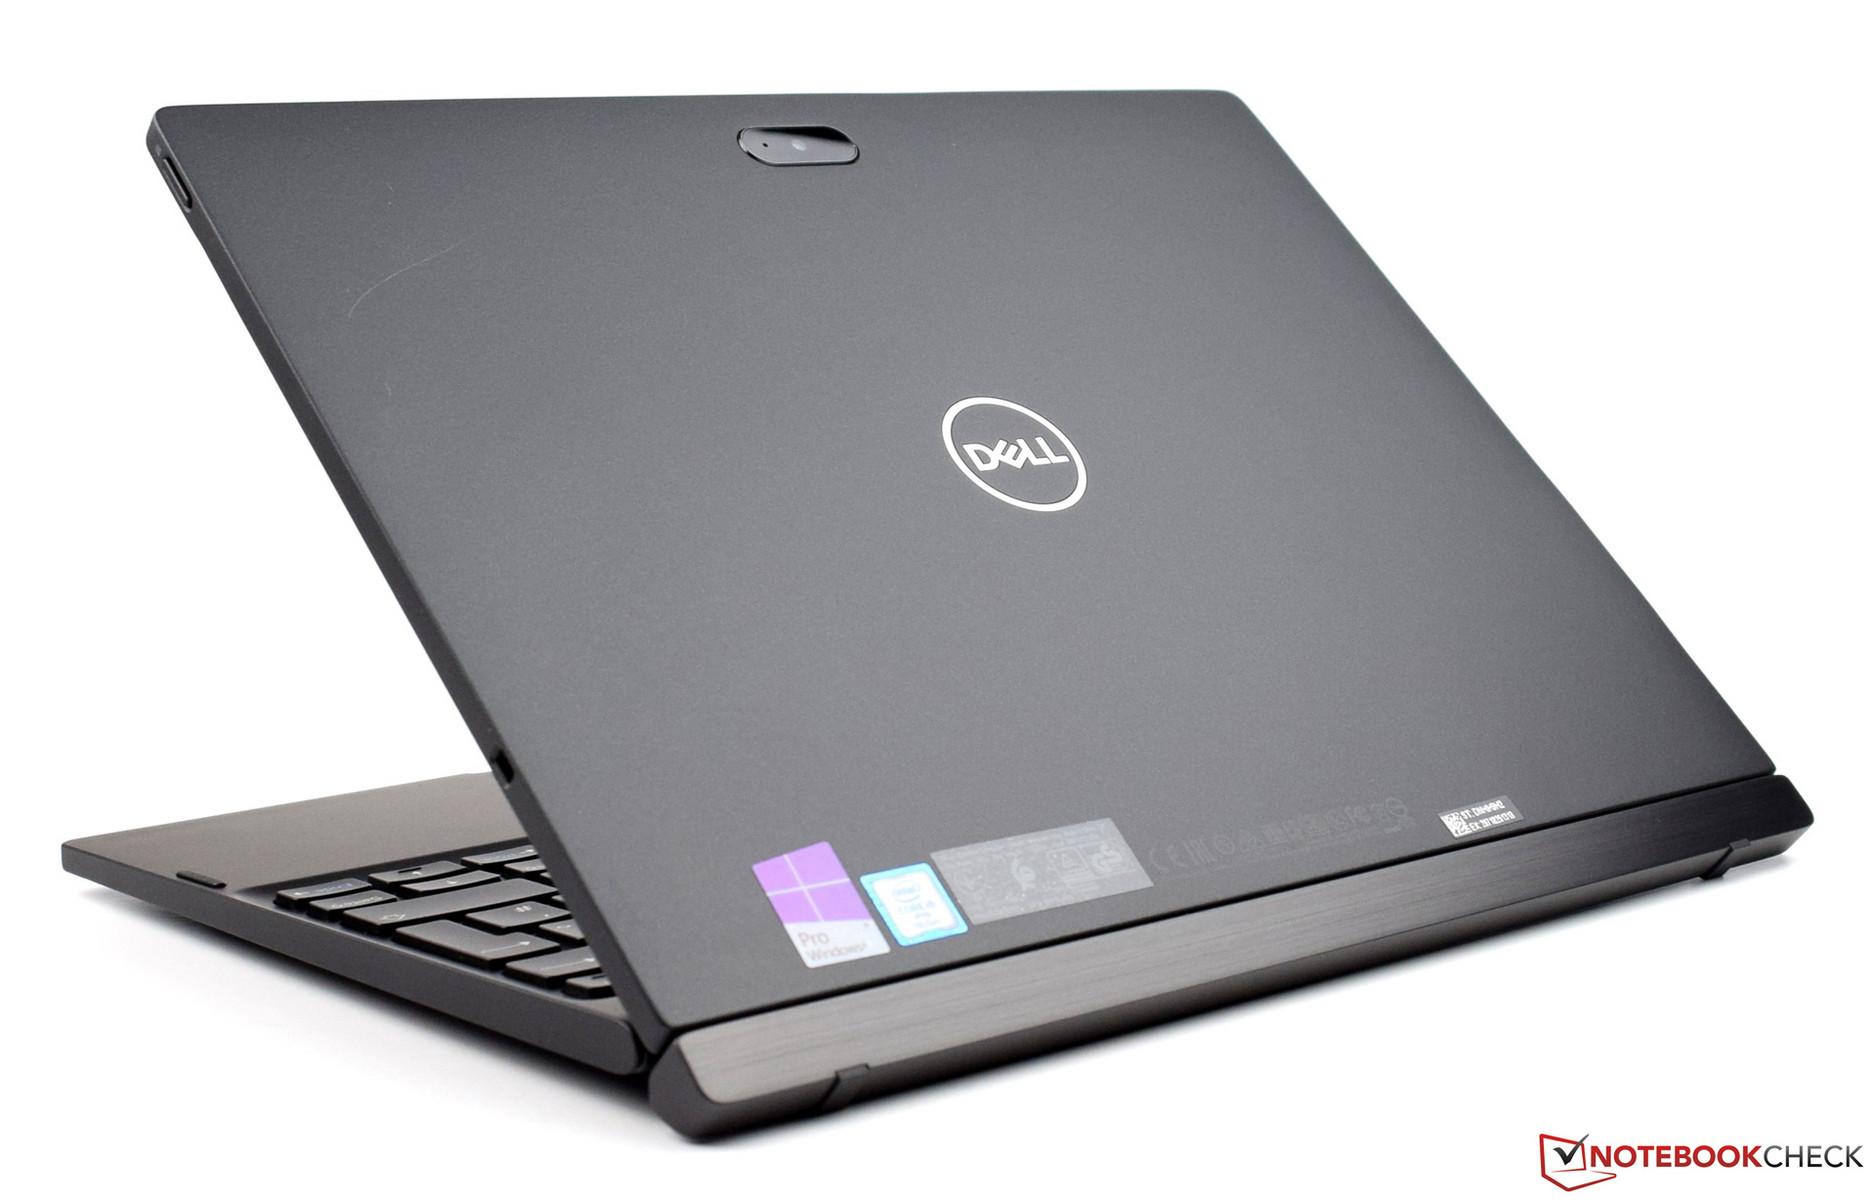 Dell Latitude 7285 I5 7y57 256 Gb 3k Convertible